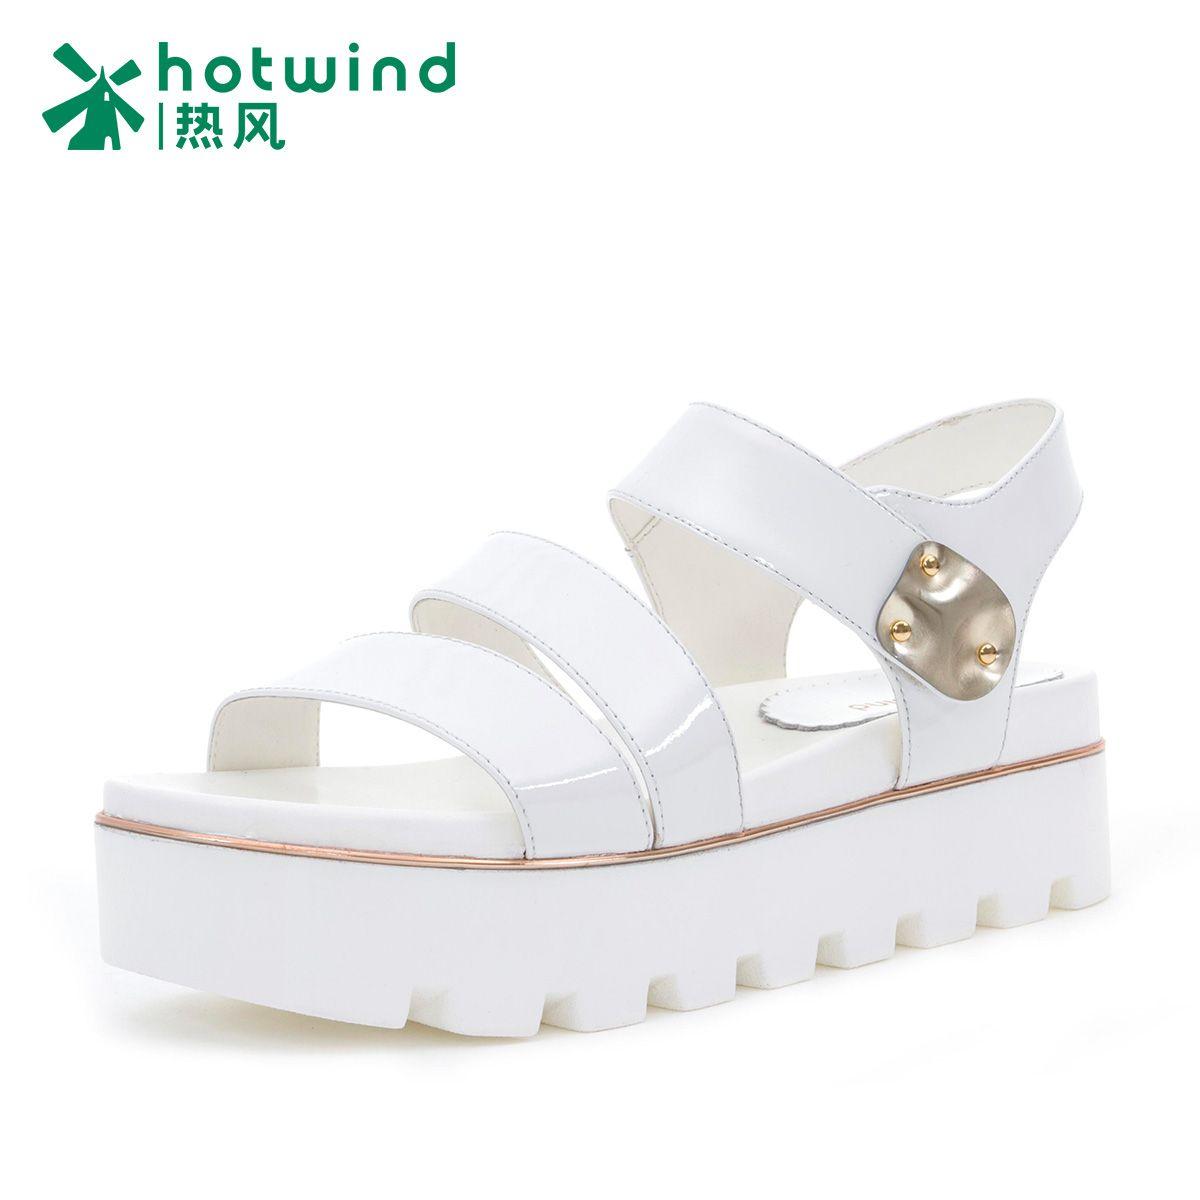 1cc08a99df61 2015 Summer Women Sandal Open-toe Velcro Ankle Strap Flat Chunky Sole Sandal  (Color